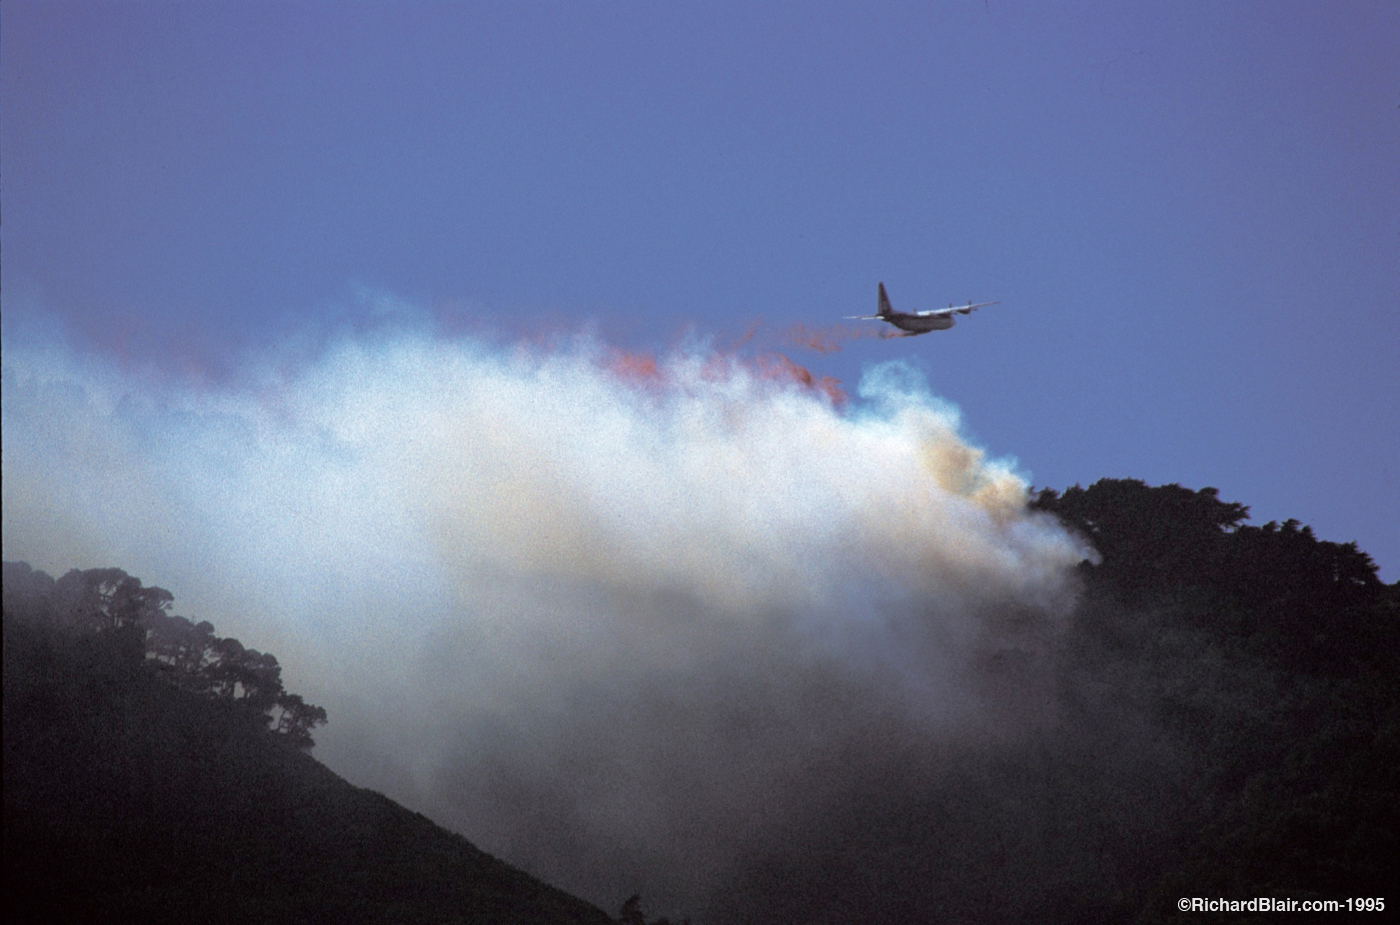 Plane Dropping Fire Retardant